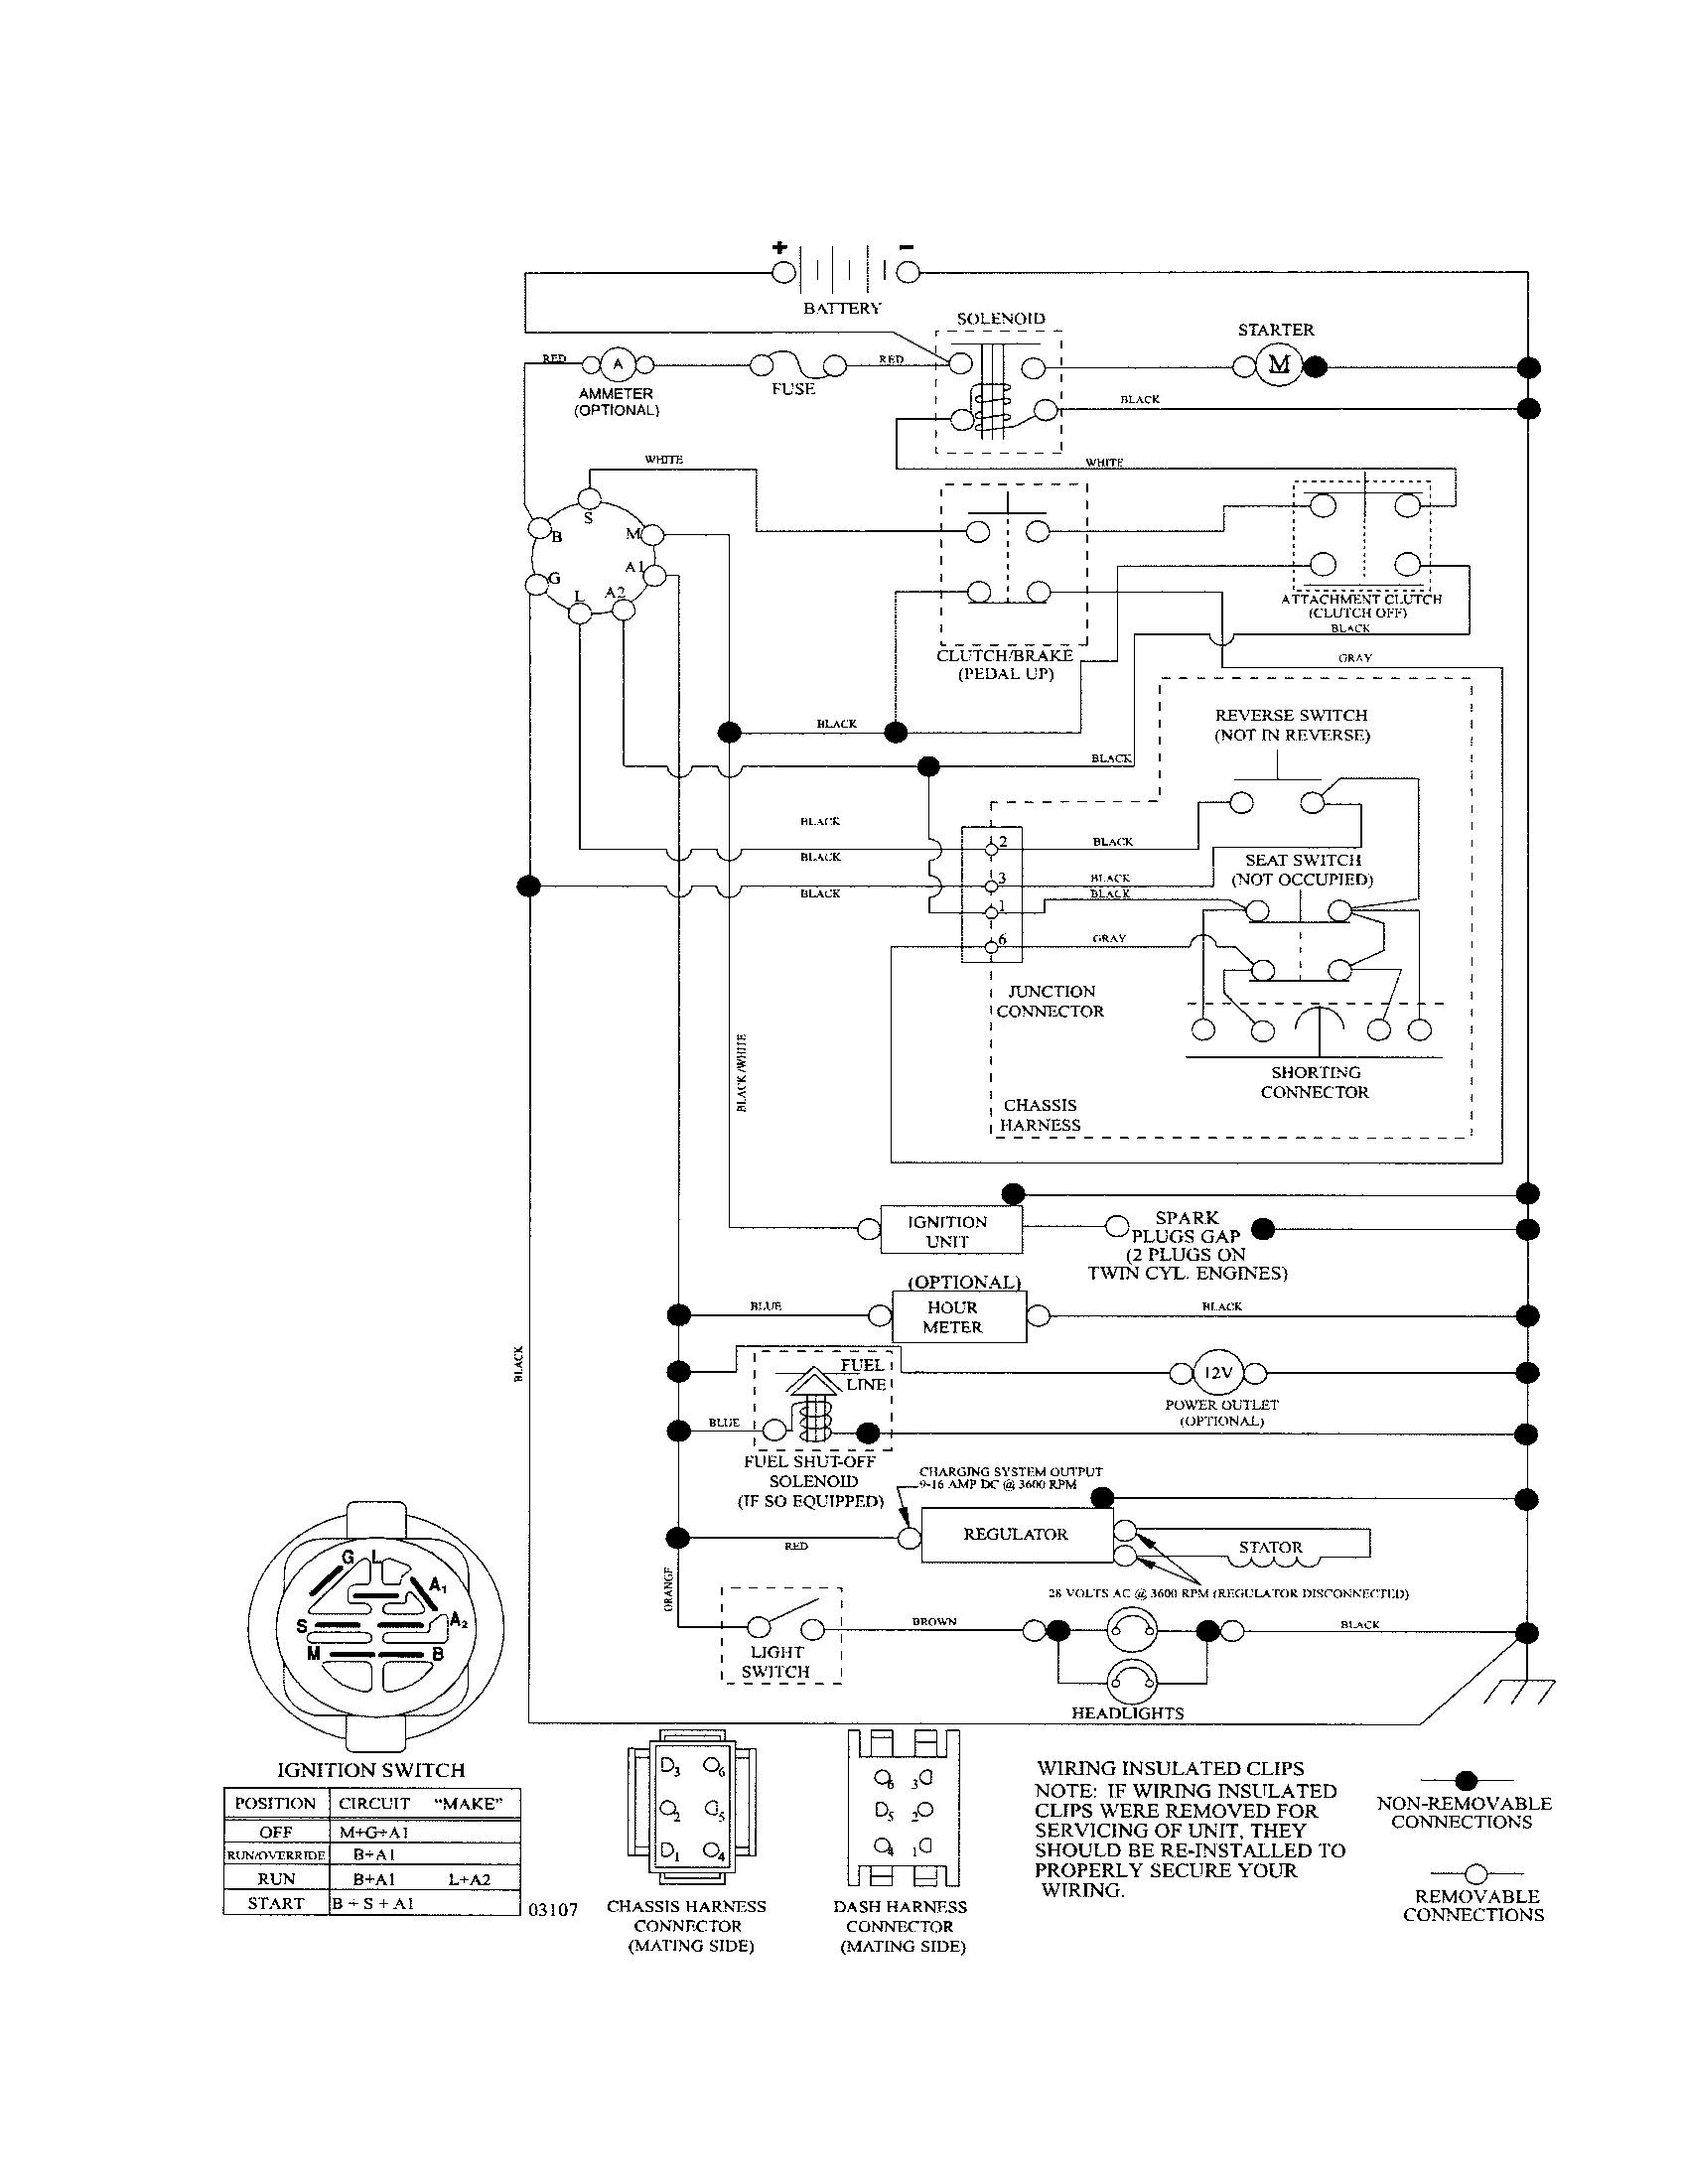 hight resolution of husqvarna wiring schematic wiring diagram review husqvarna wiring schematic wiring diagrams husqvarna riding mower wiring schematic